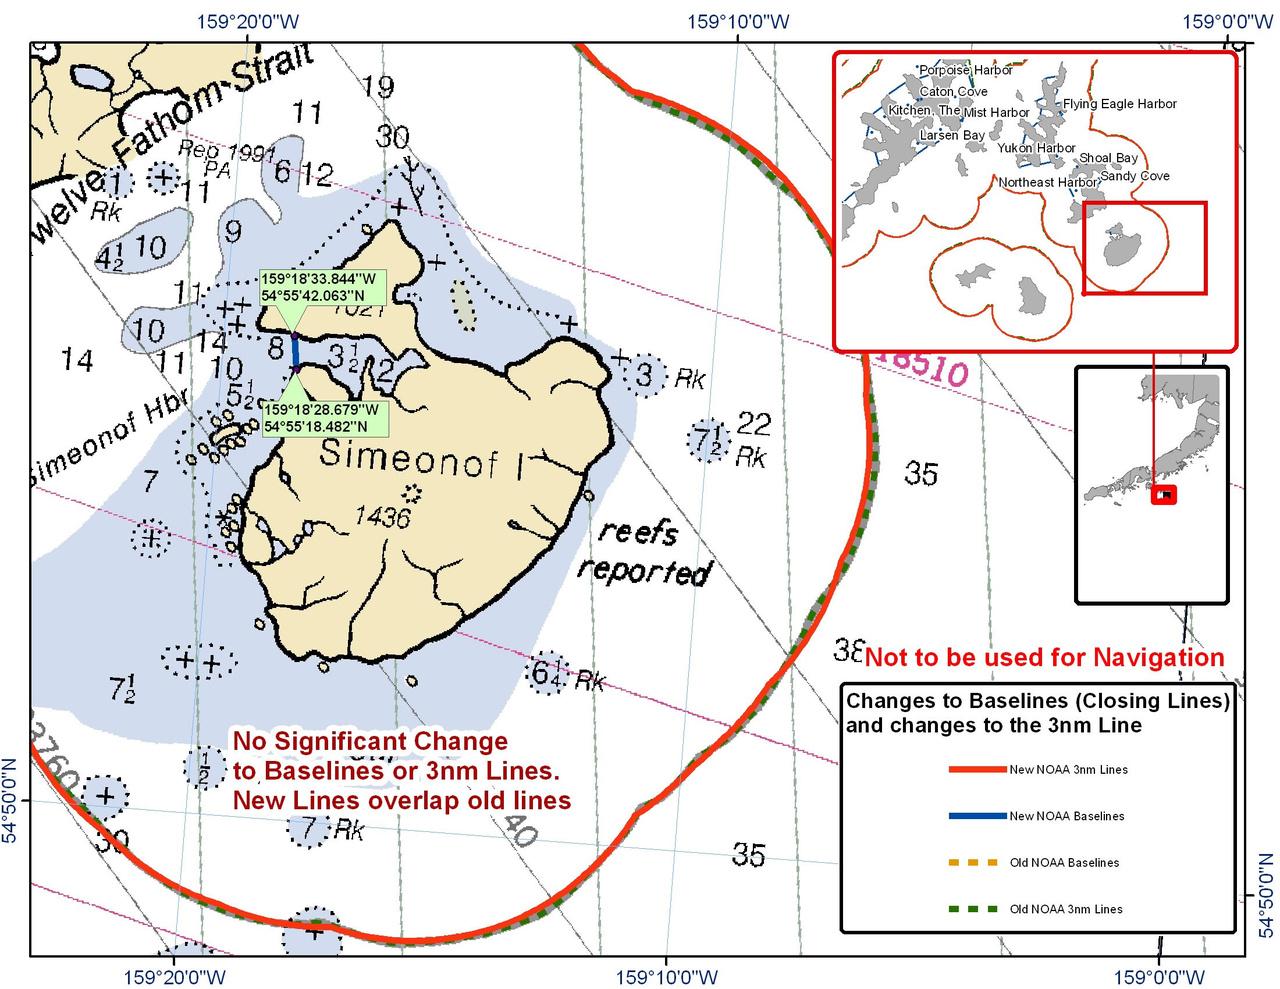 Chart for Simeonof Island